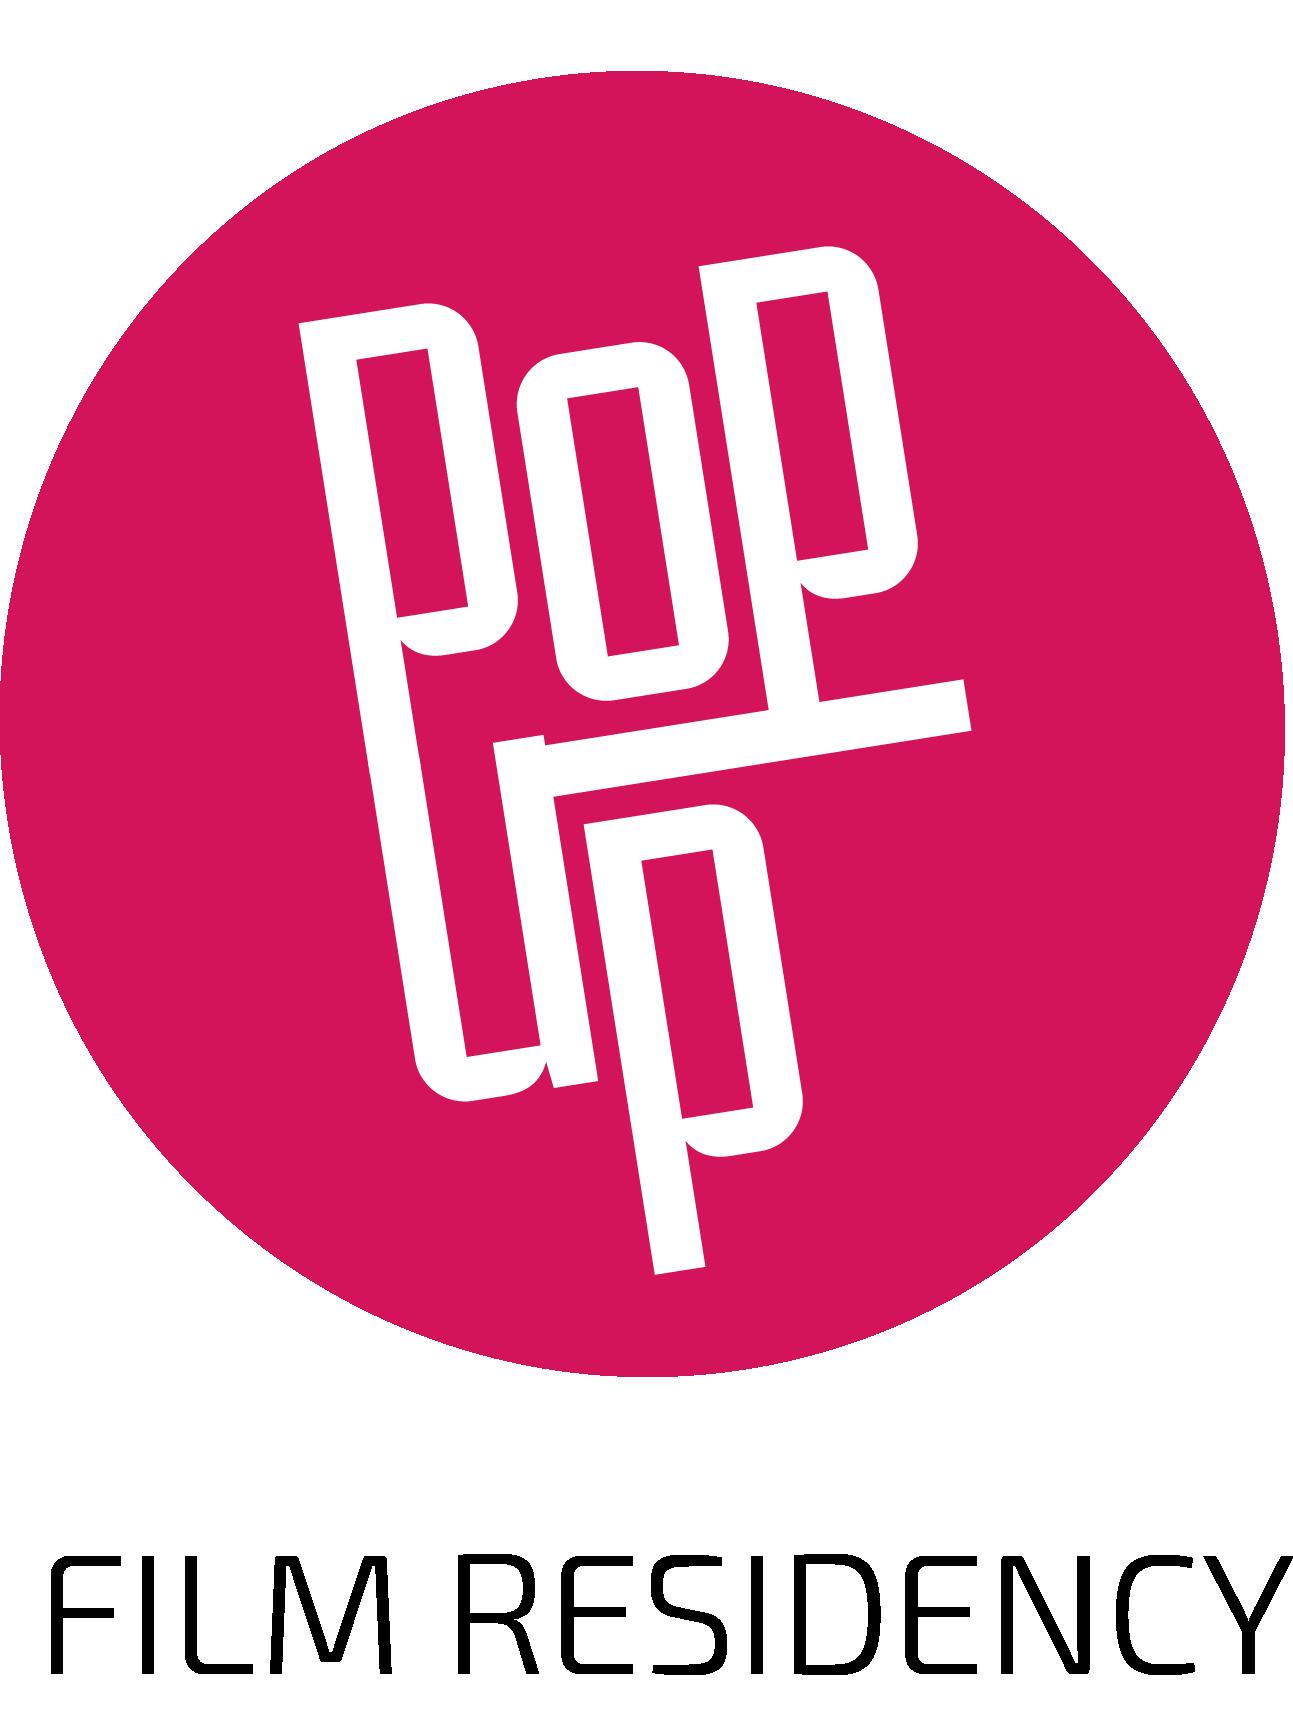 Pop Up Film Residency